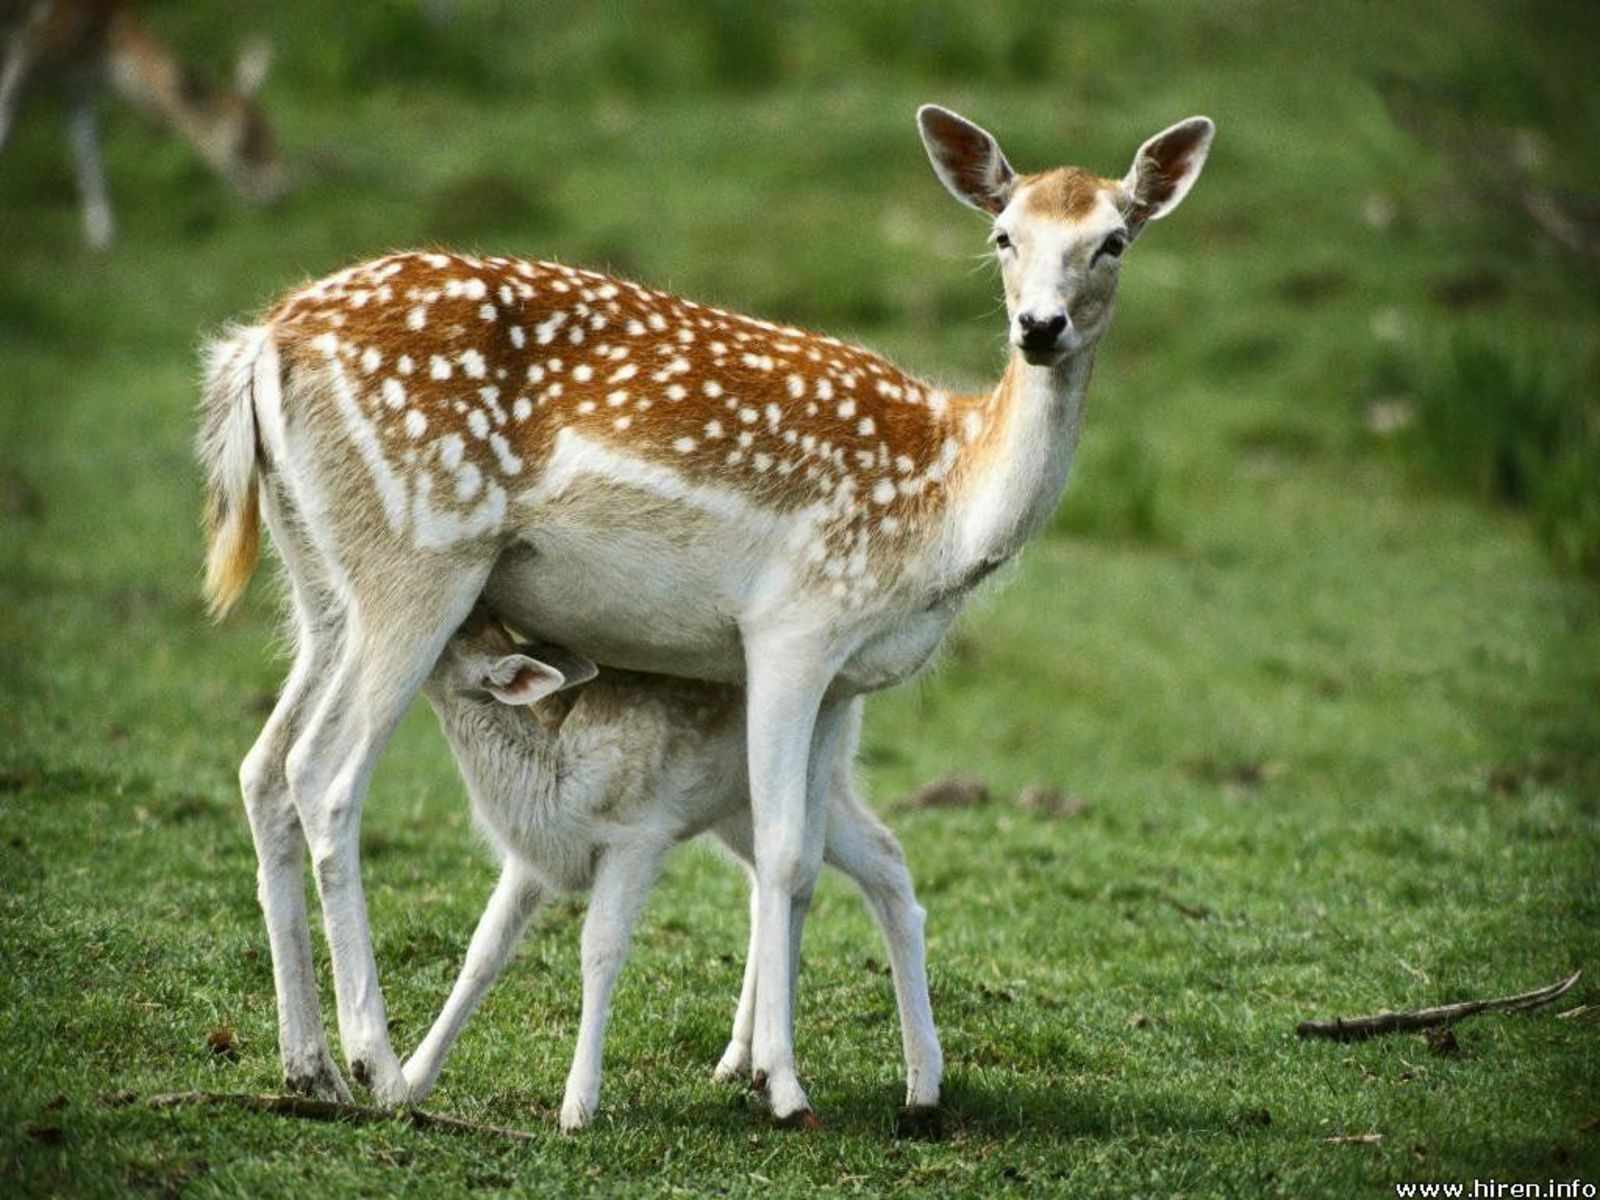 http://2.bp.blogspot.com/_EAViqbzwc_s/TN_R8lNKqxI/AAAAAAAACDM/JDarbZtjsiM/s1600/deer-and-baby-deer.jpg